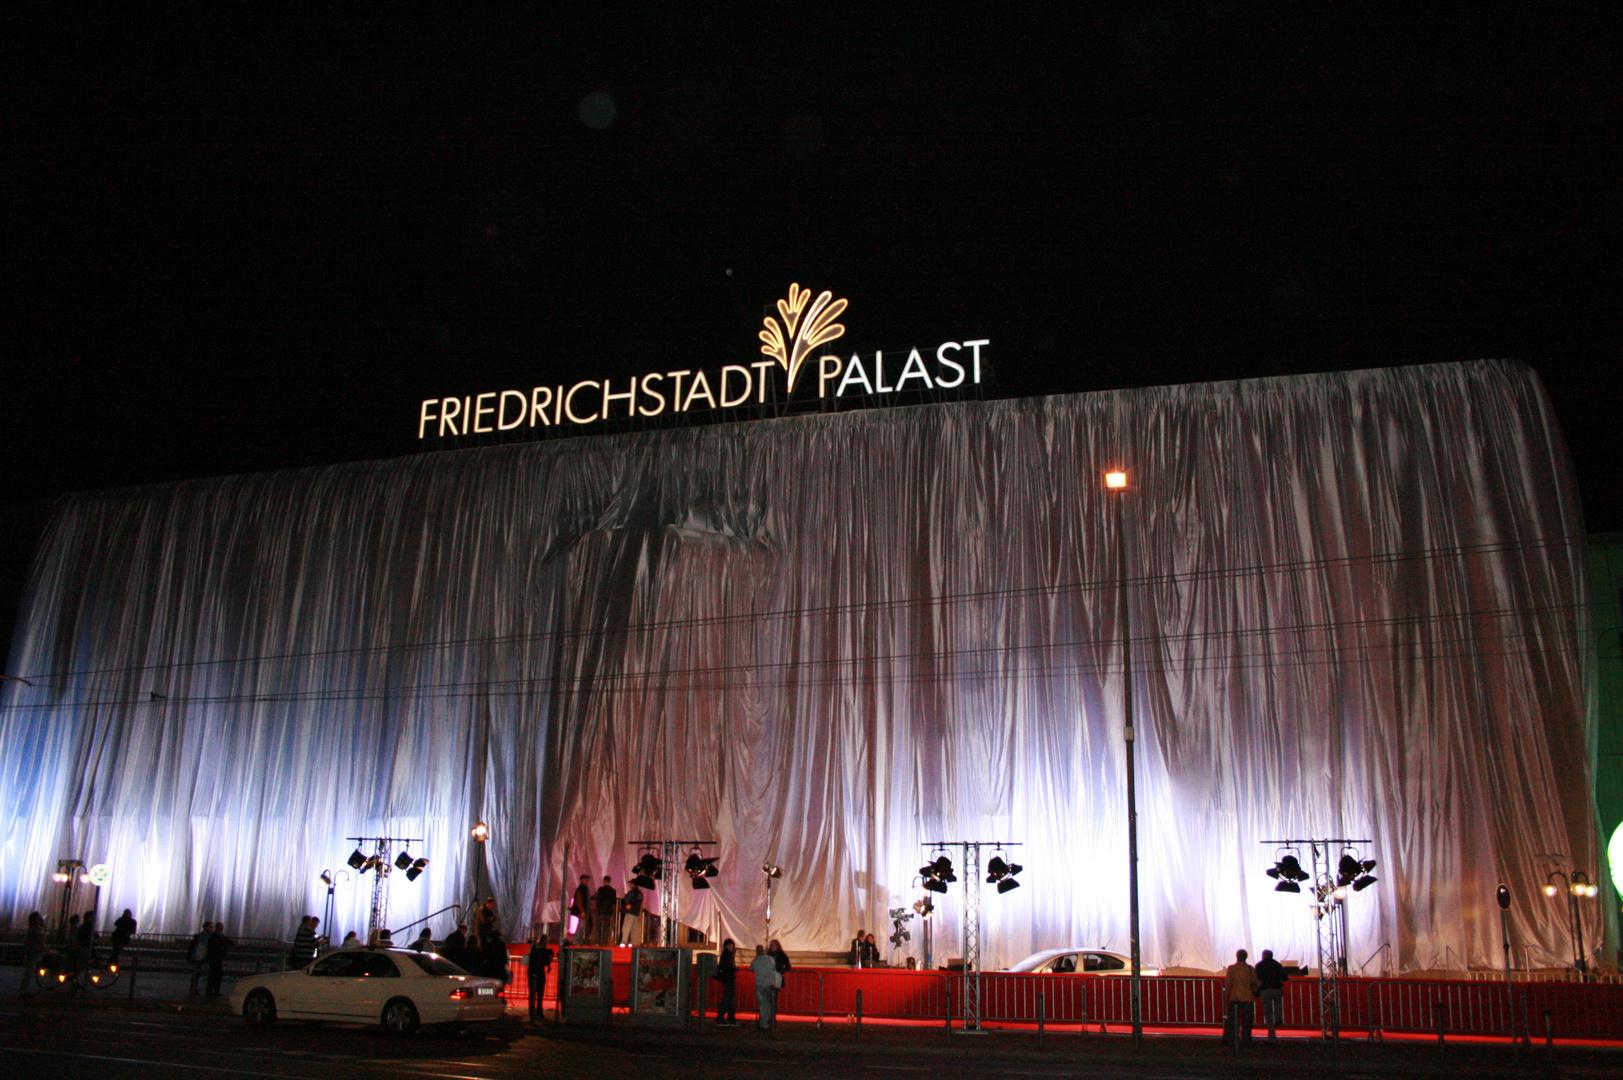 Friedrichstadtpalast eingehüllt